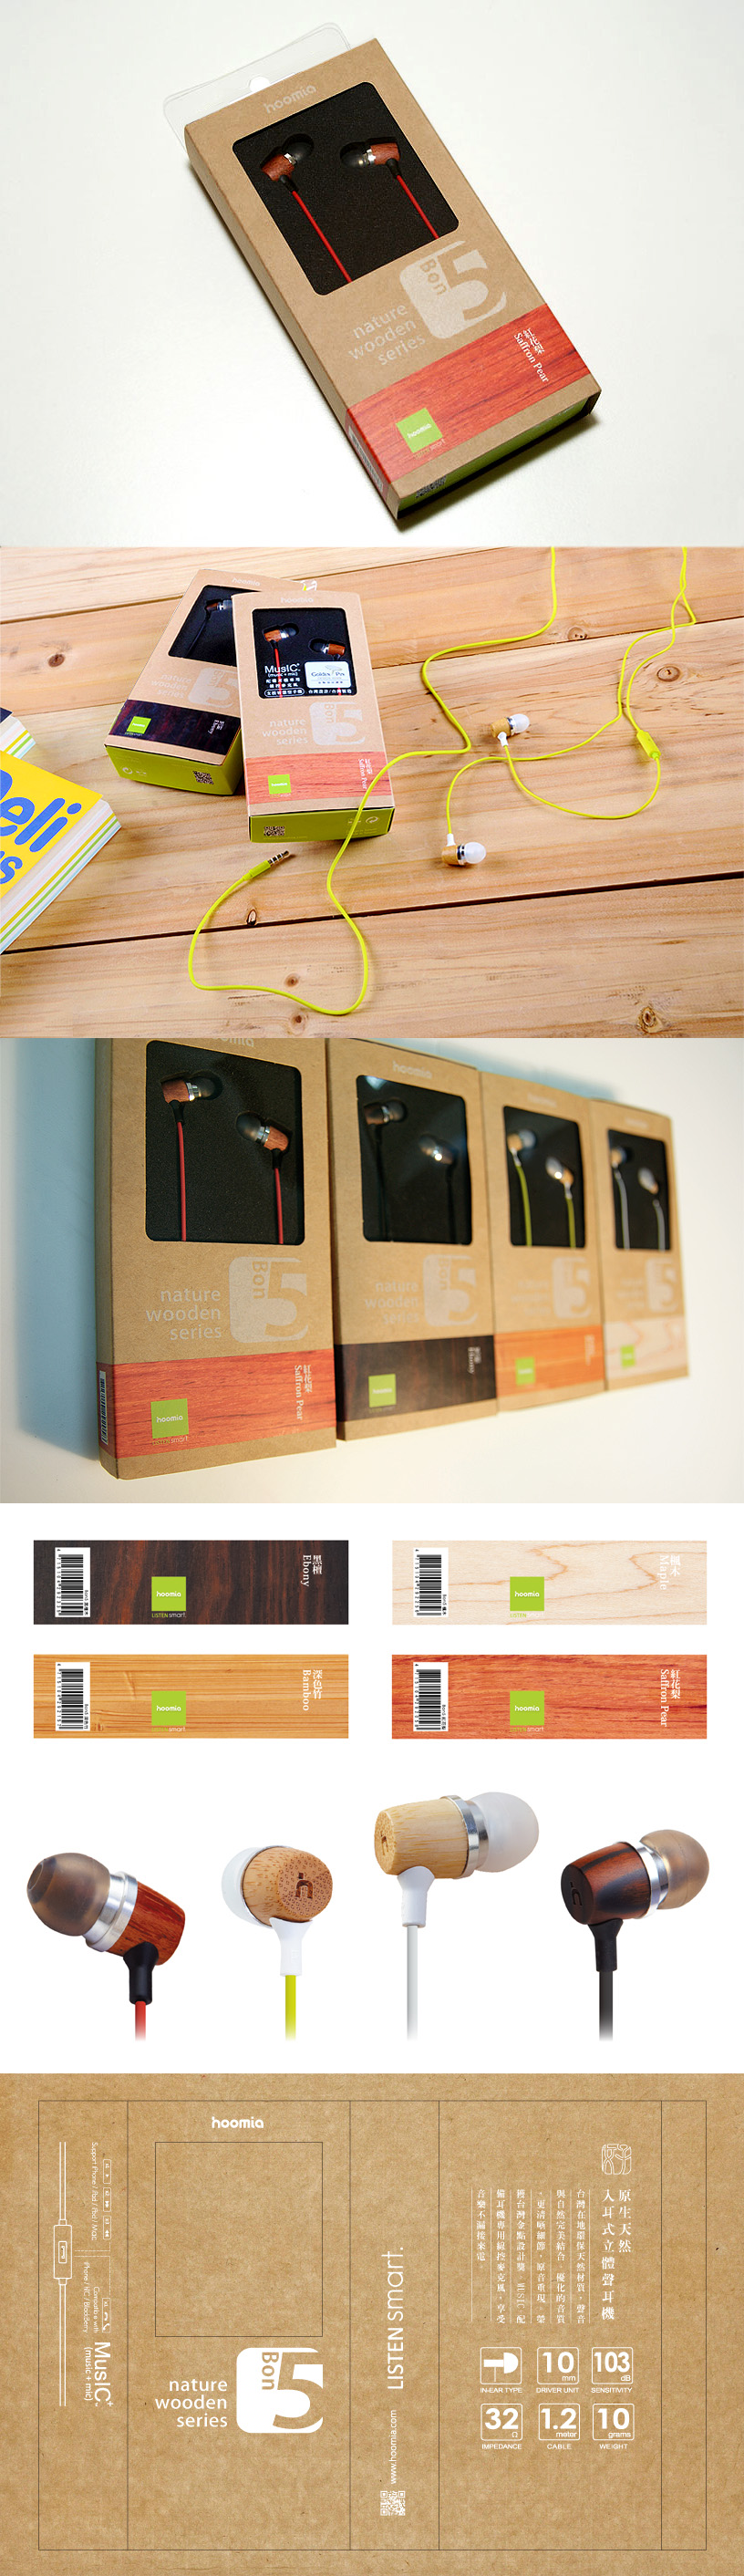 hoomia Bon5 nature wooden series earphone packaging design.